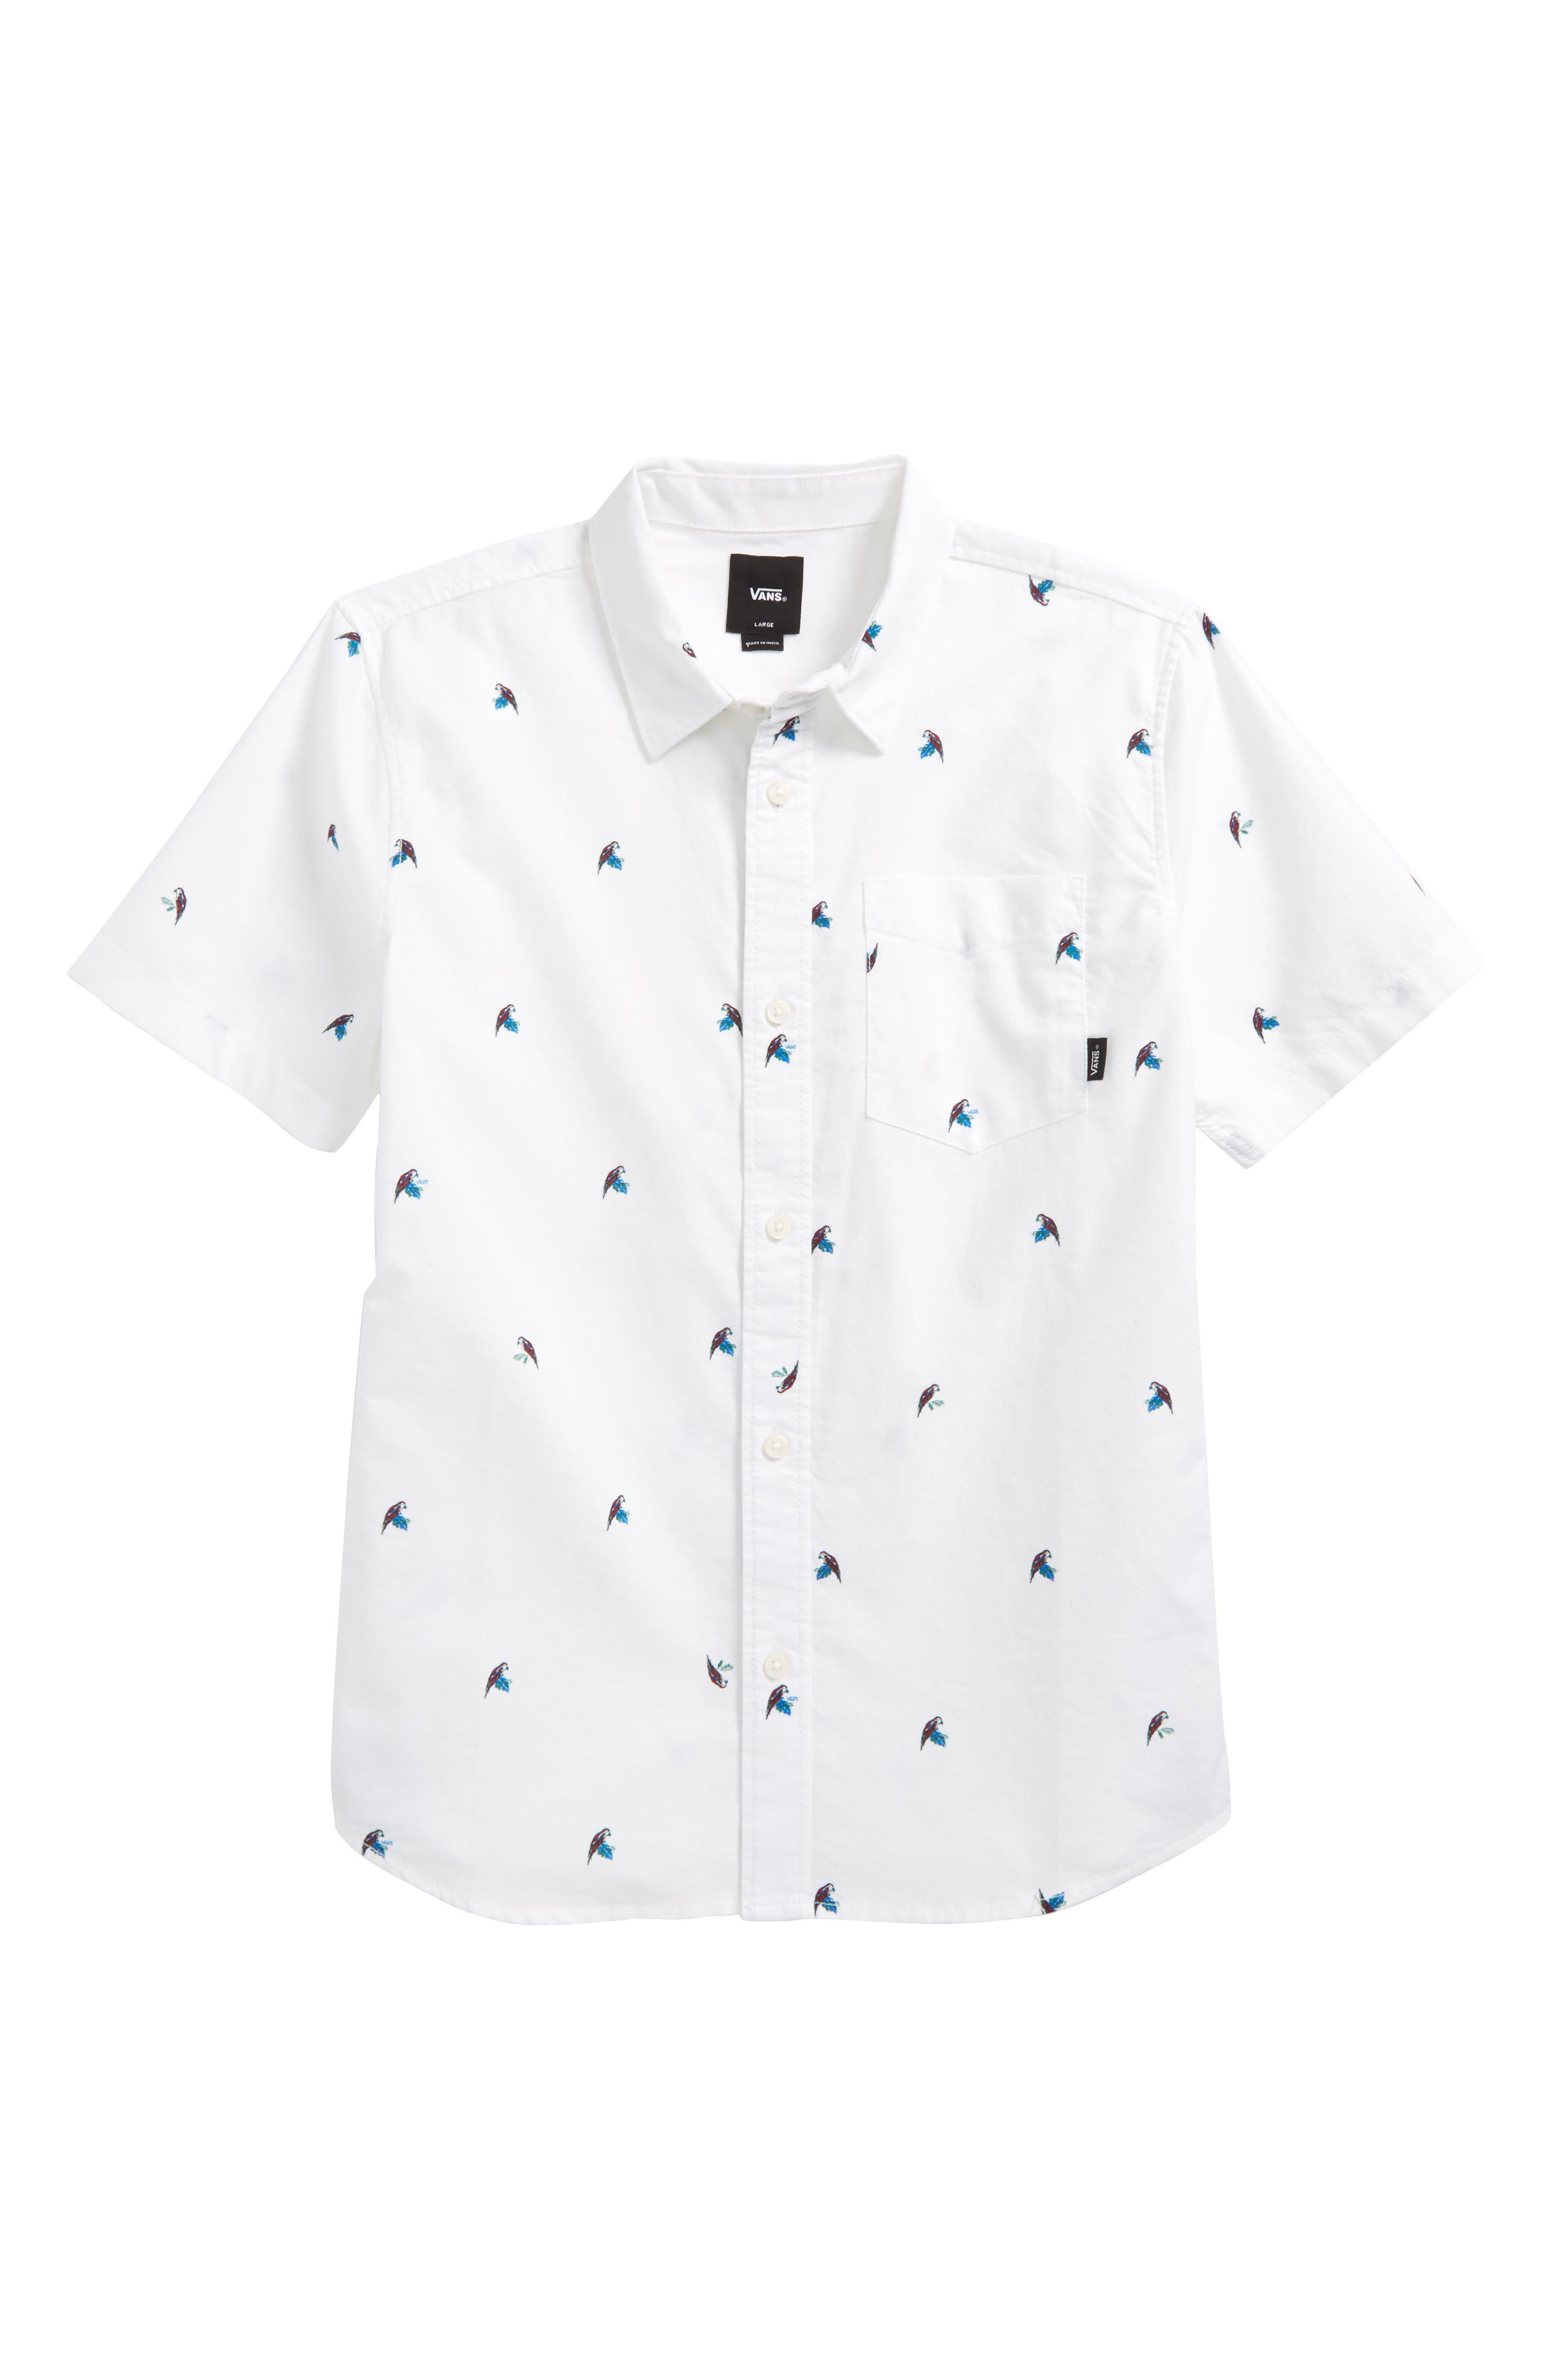 Alternate Image 1 Selected - Vans Houser Woven Shirt (Big Boys)